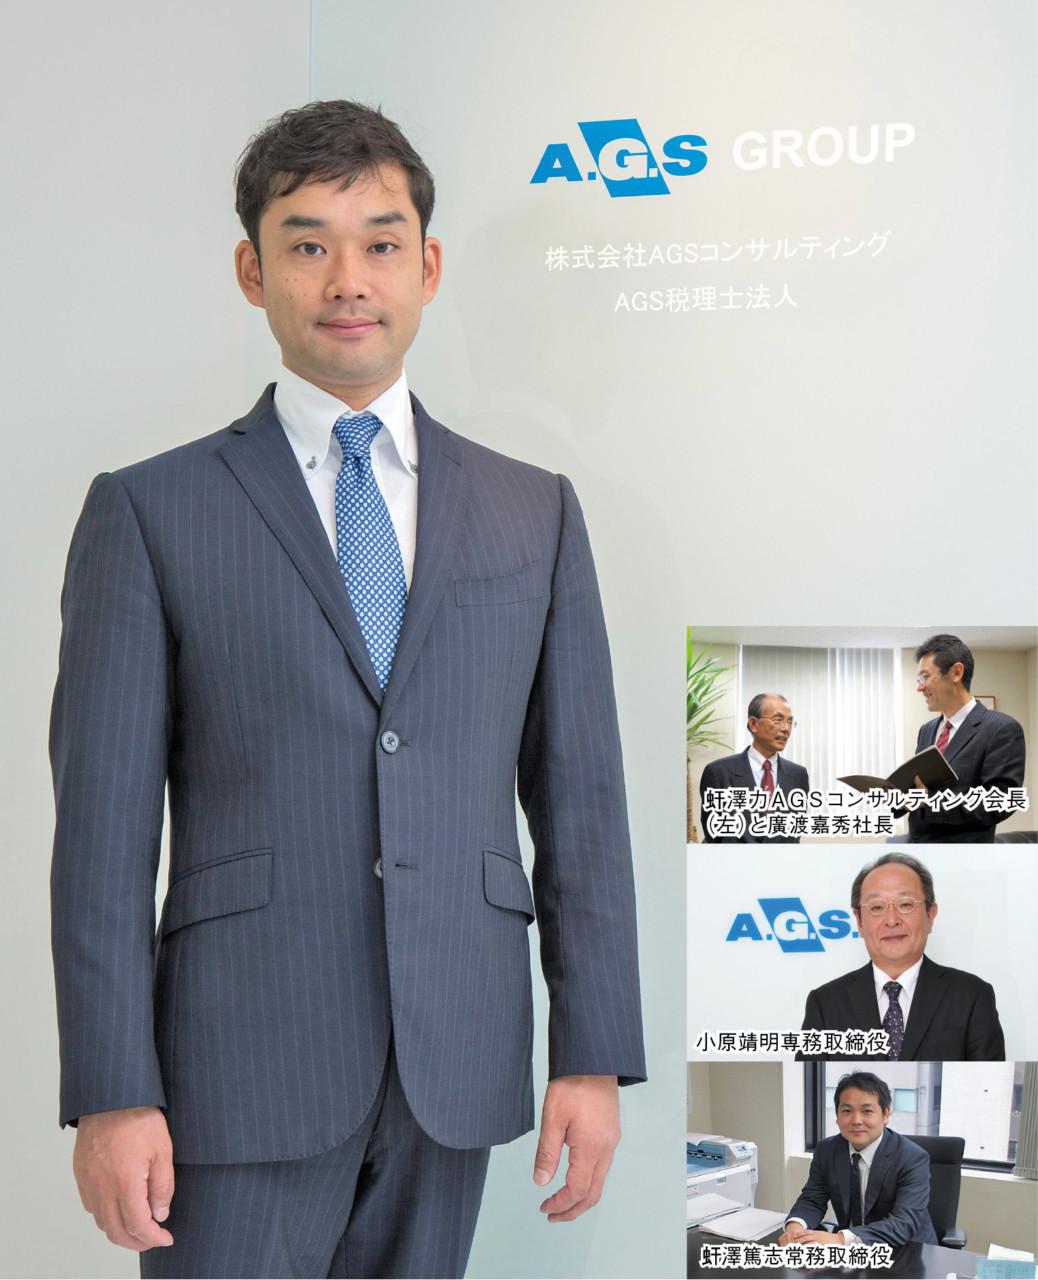 税理士 法人 Ags